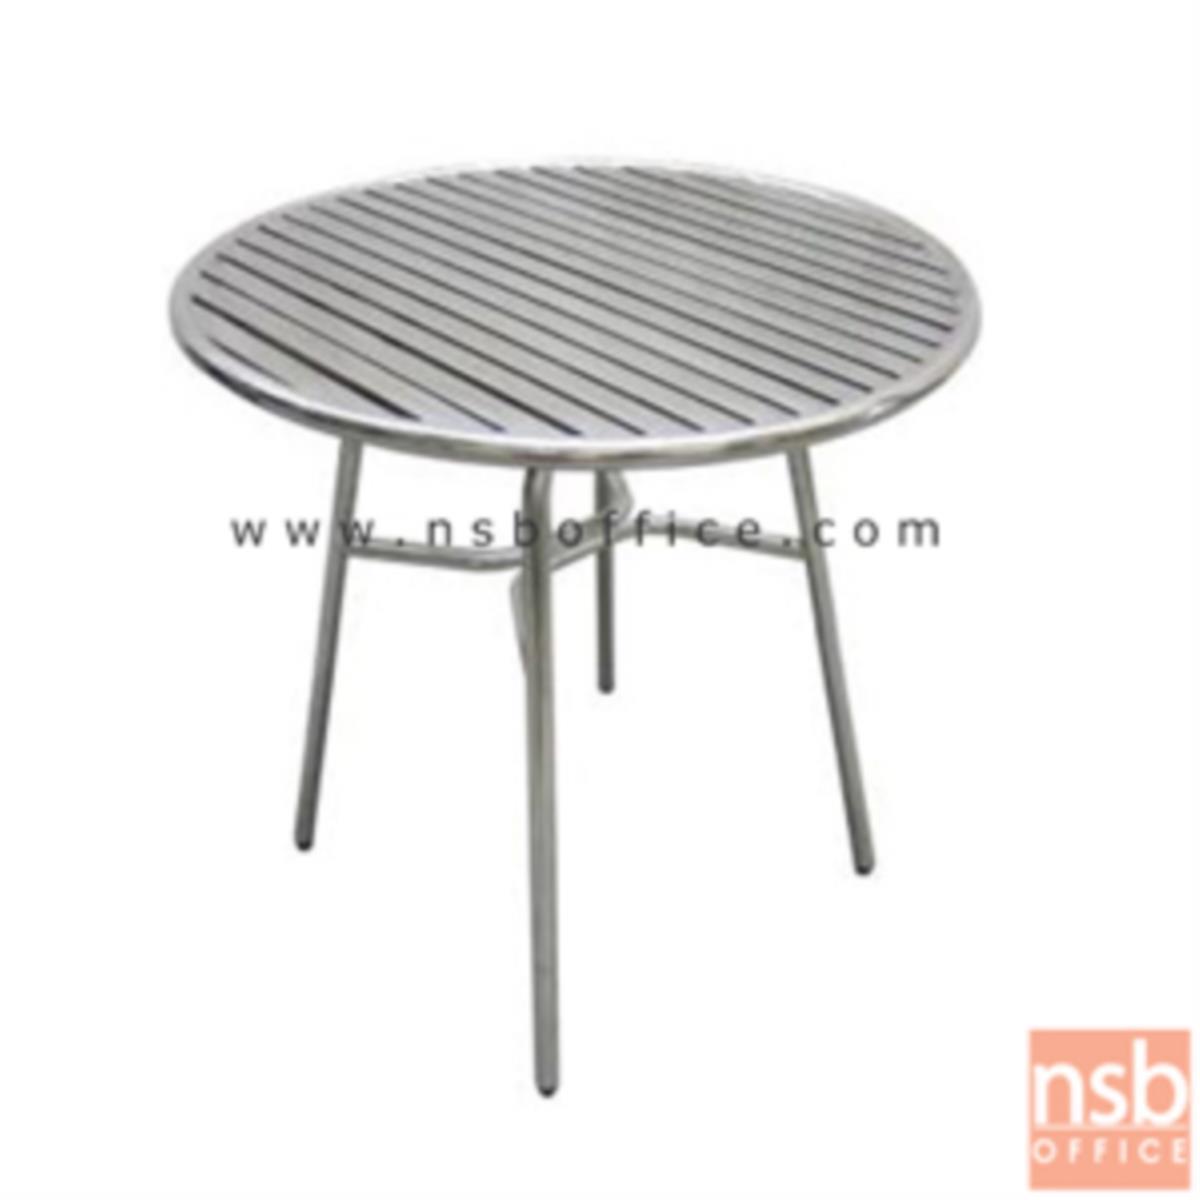 G12A103:โต๊ะหน้าสเตนเลสหน้าระแนง รุ่น Hushim (ฮัสฮิม) ขนาด 75Di cm.  ขาสเตนเลส